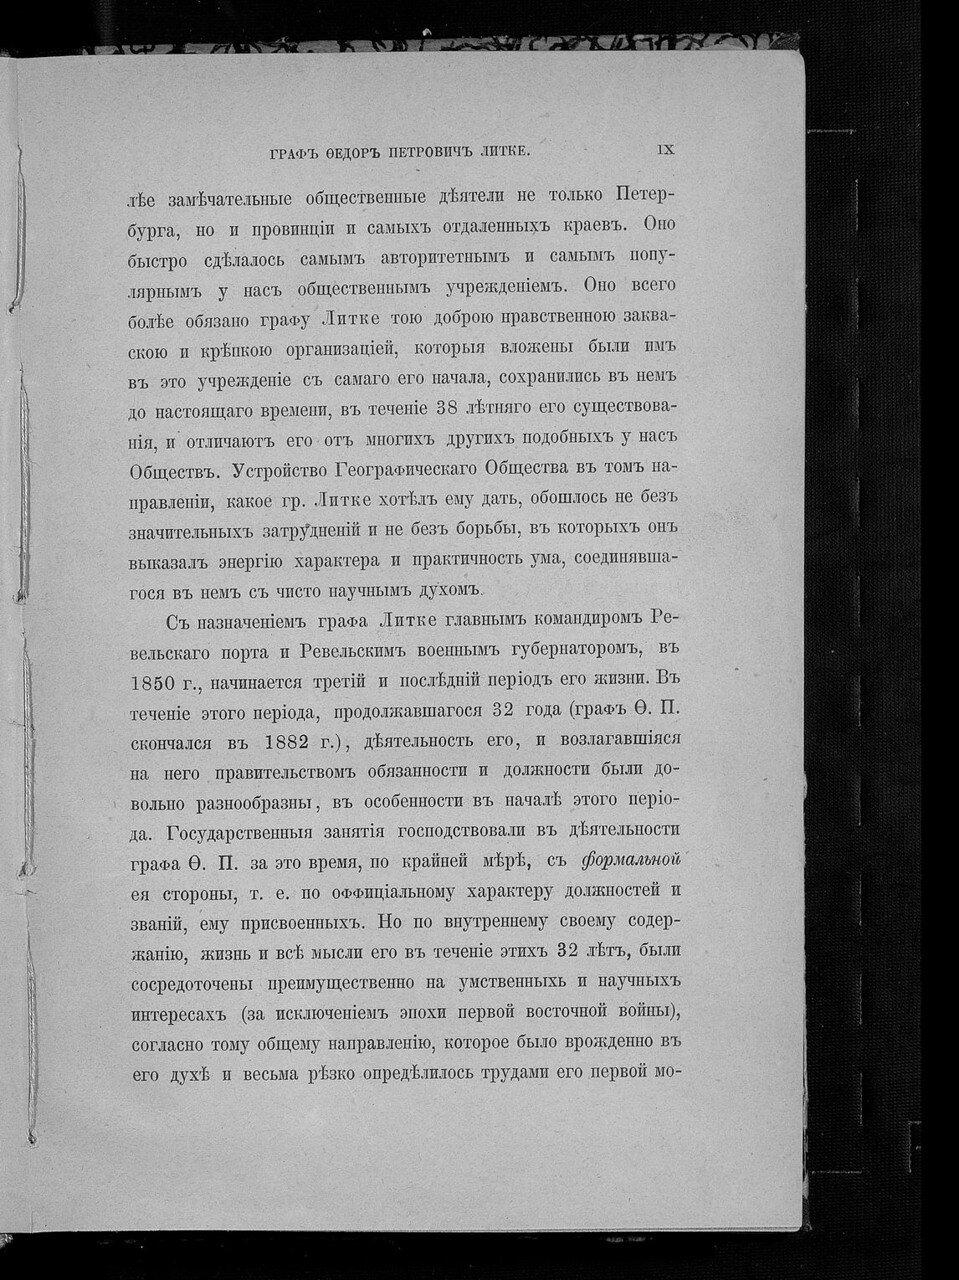 https://img-fotki.yandex.ru/get/508799/199368979.d2/0_21dd5b_bc2aba2c_XXXL.jpg